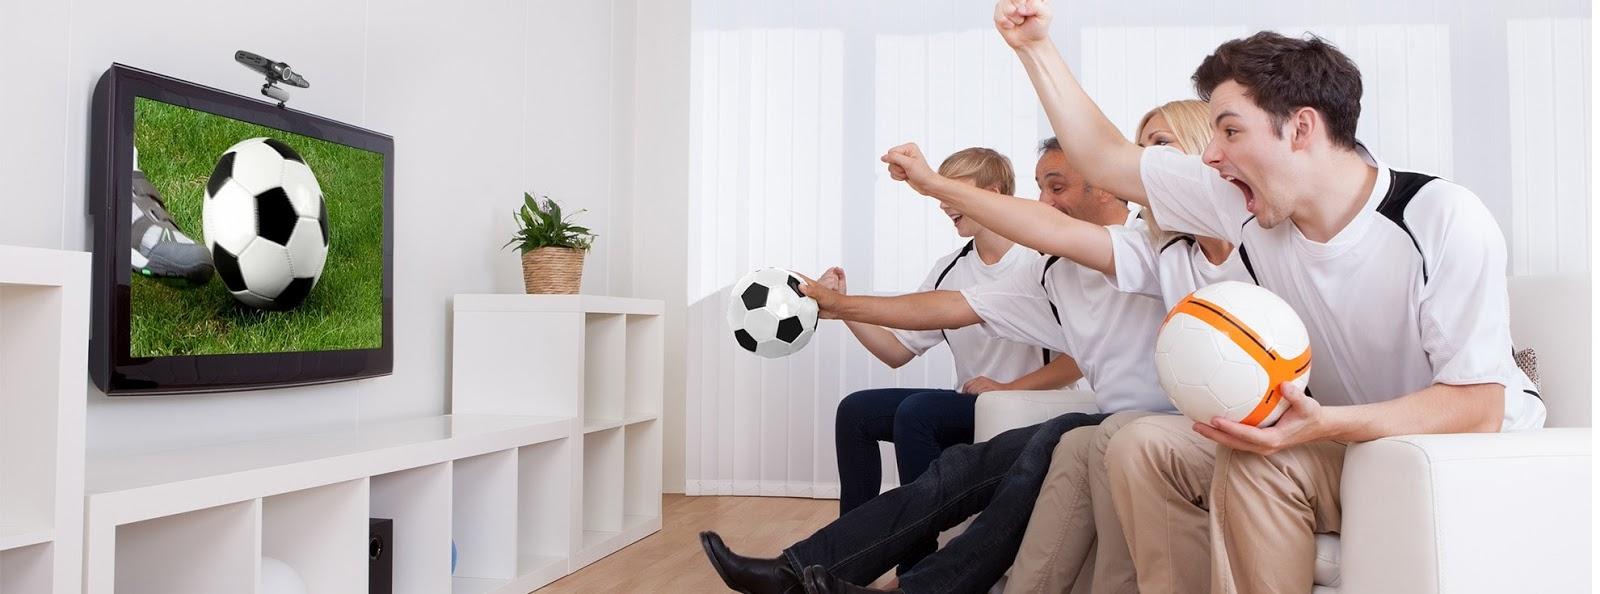 Смотрит футбол по телевизору картинка